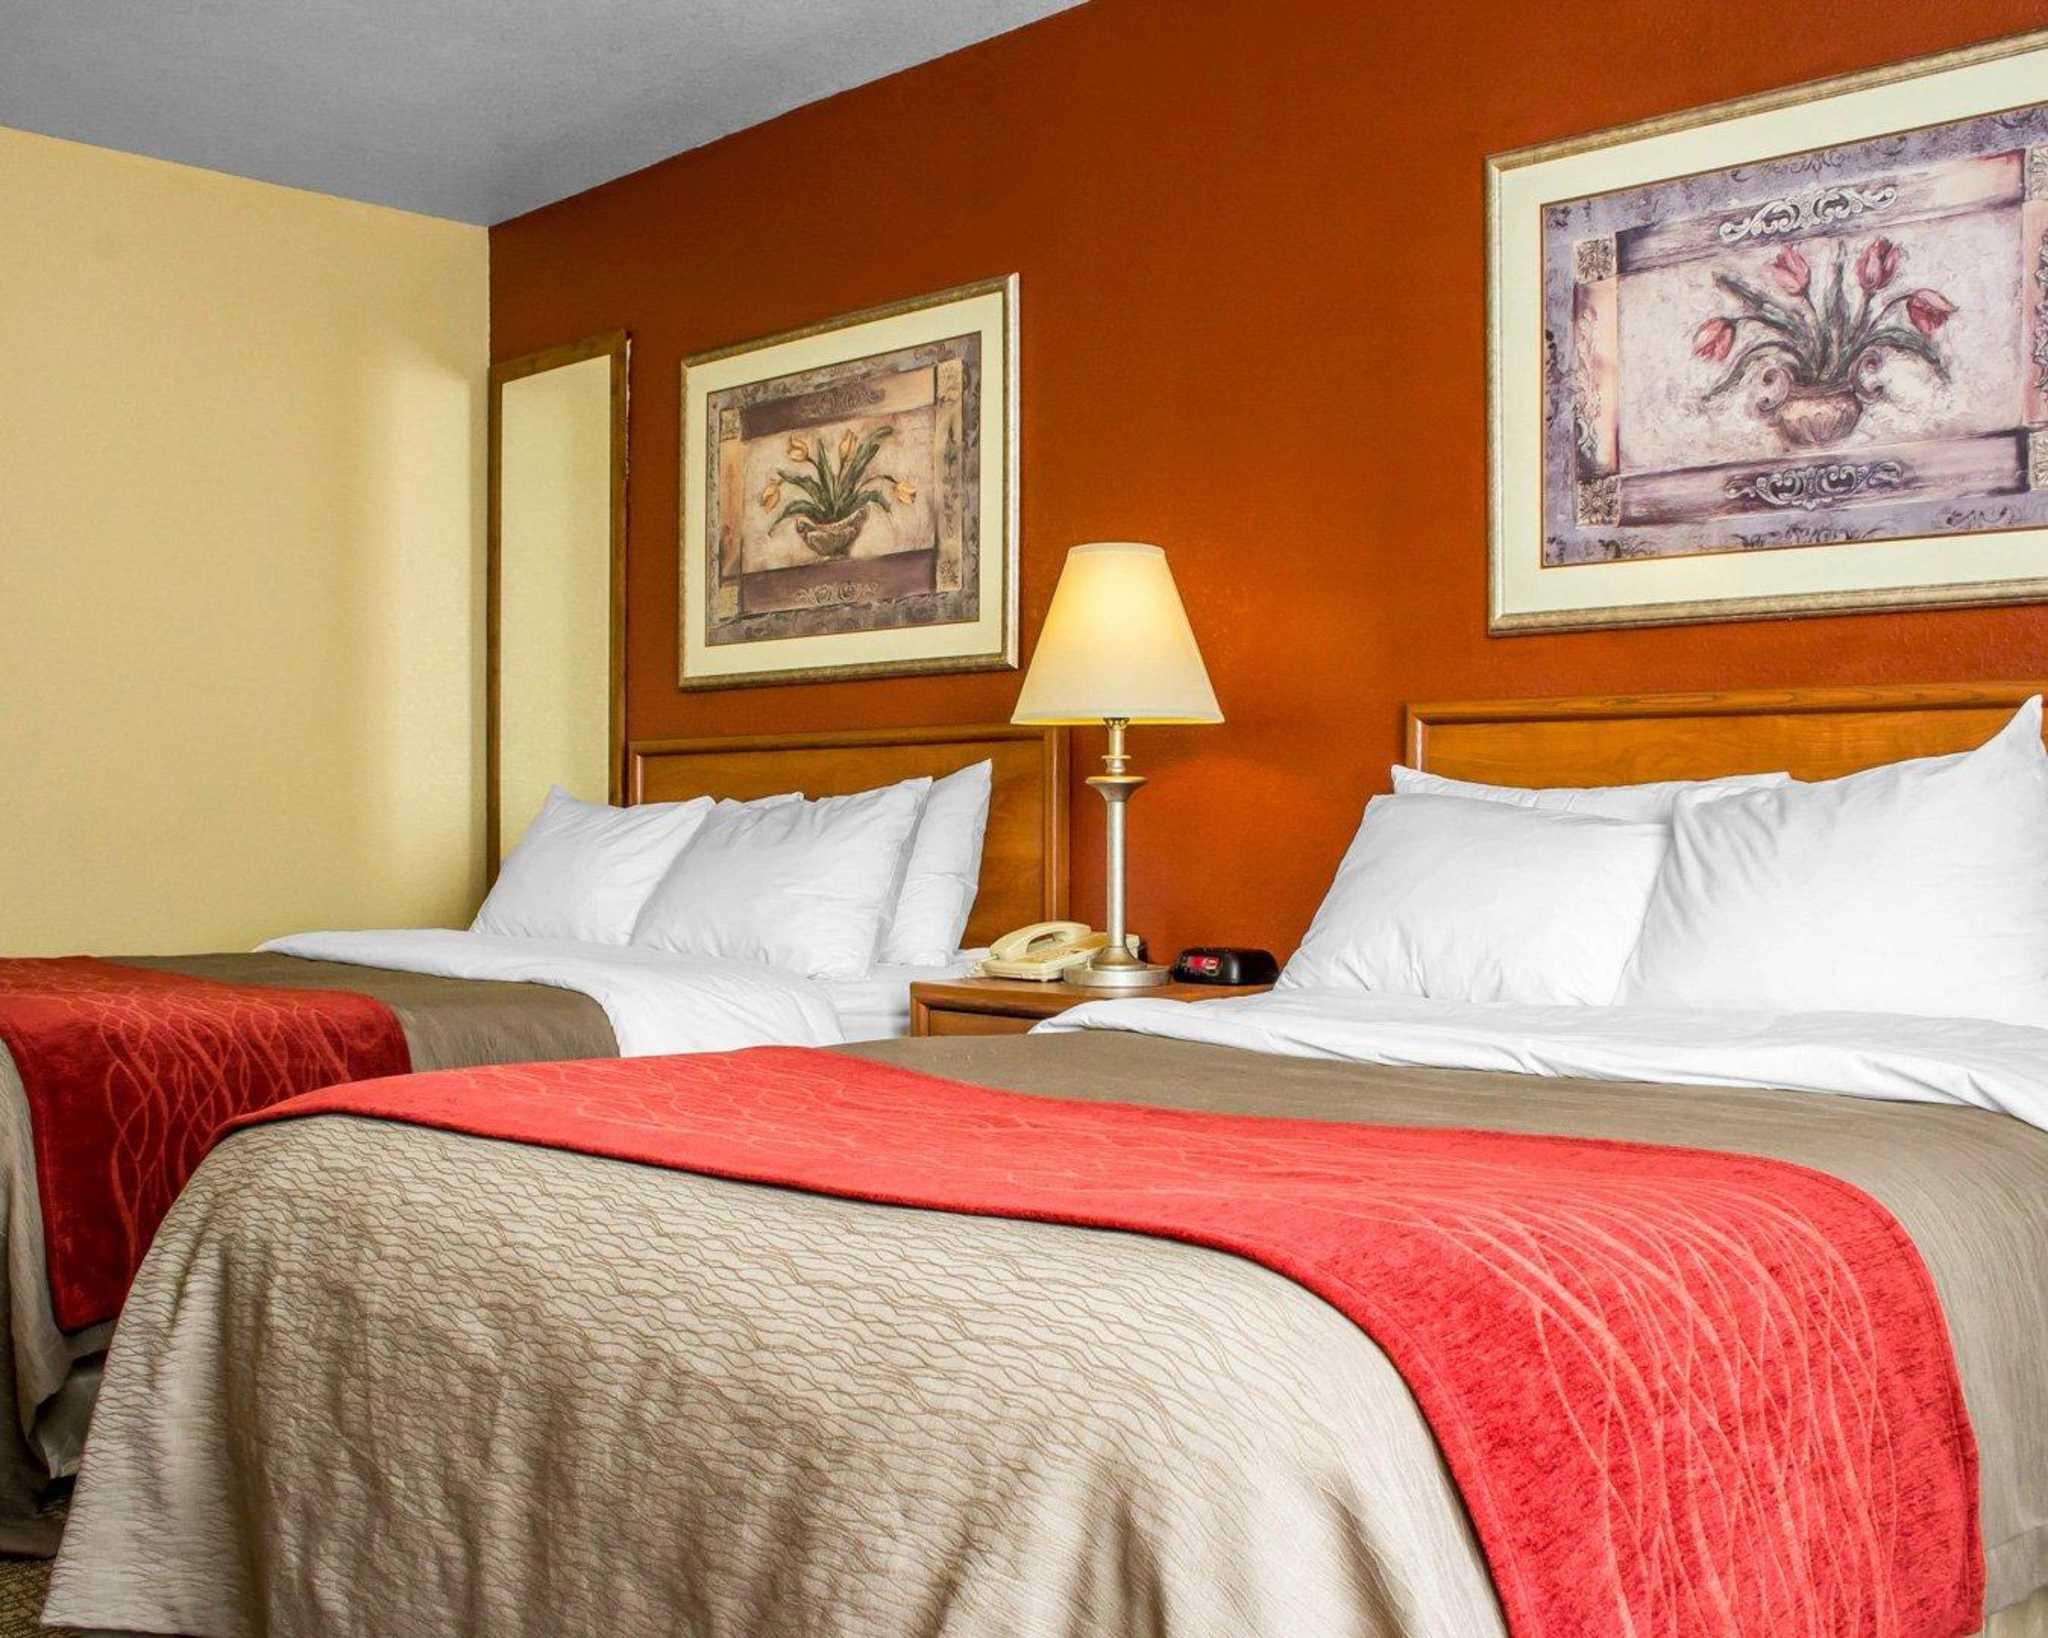 sol casino valley hotels best western hotel near comfort inn del other green resort comforter az